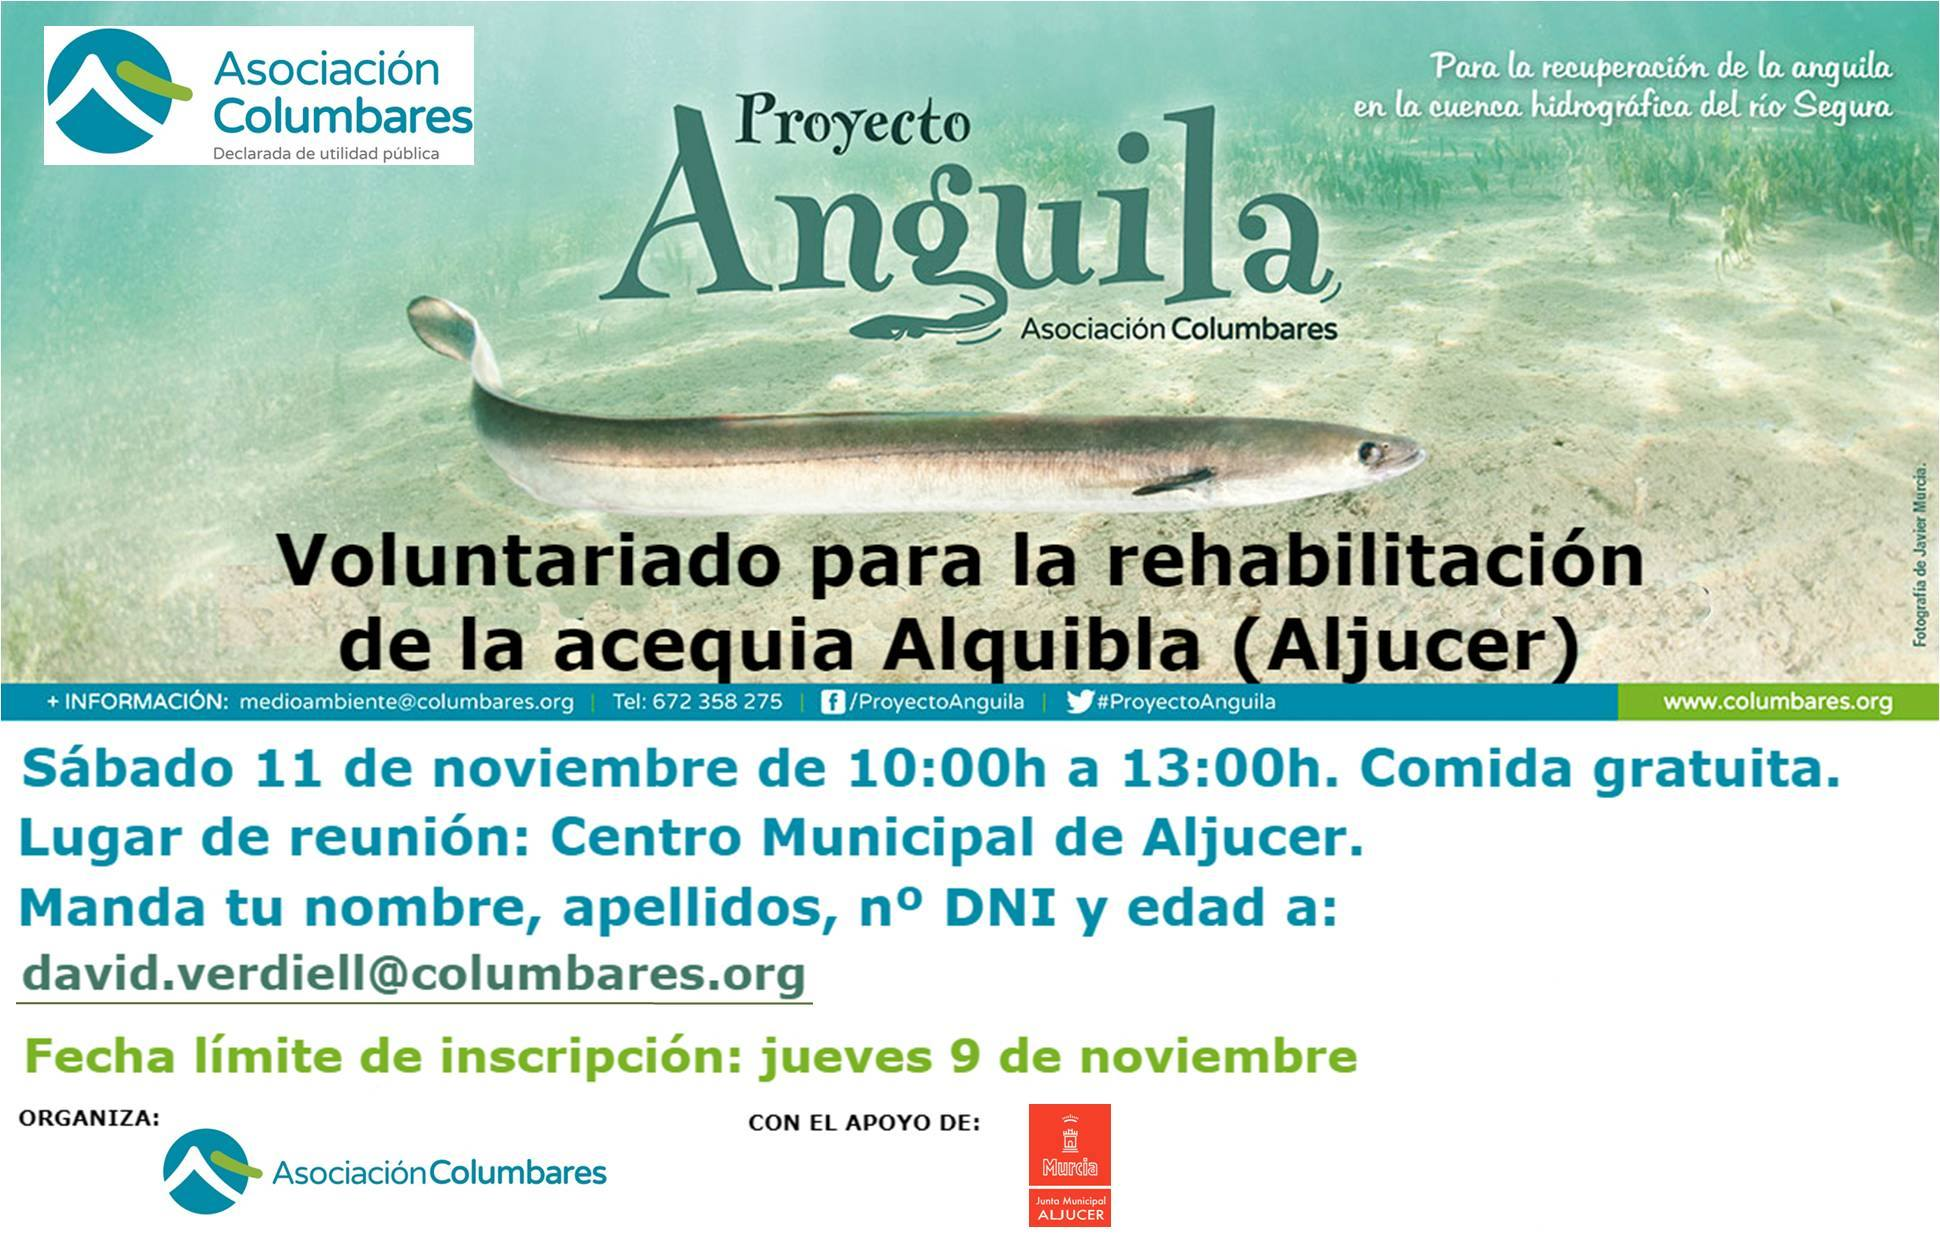 Rehabilitación de la acequia Alquibla, con la Asociación Columbares